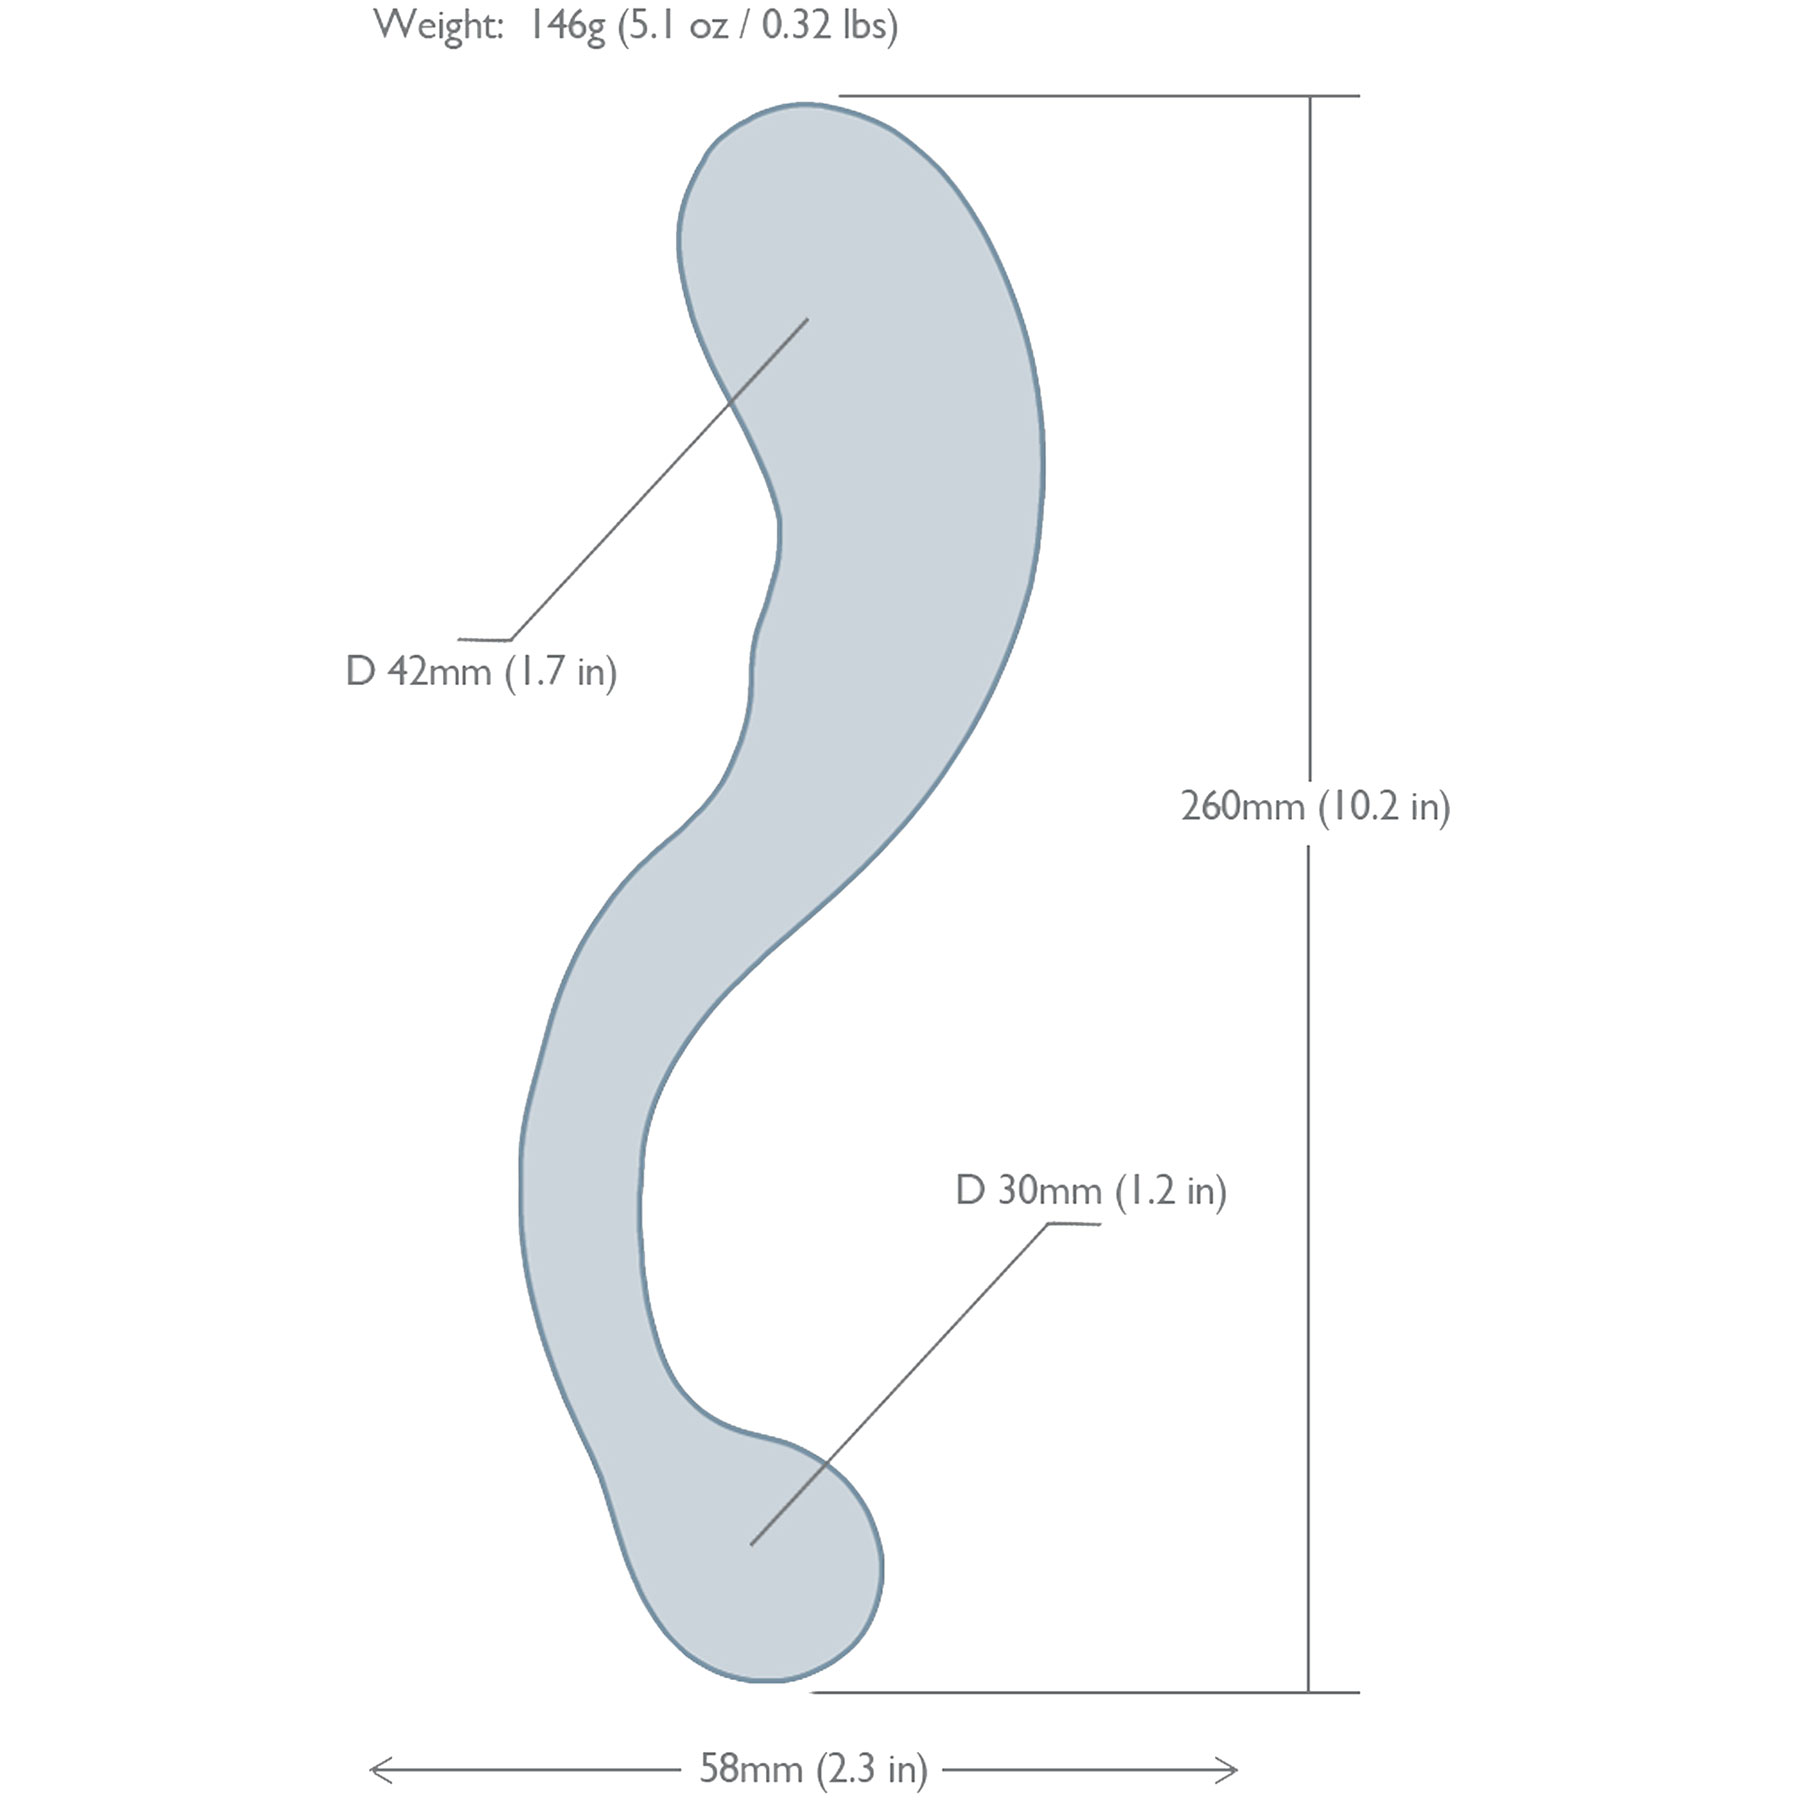 NobEssence Seduction 2.0 Sculptured Hardwood G-Spot Dildo - Measurements